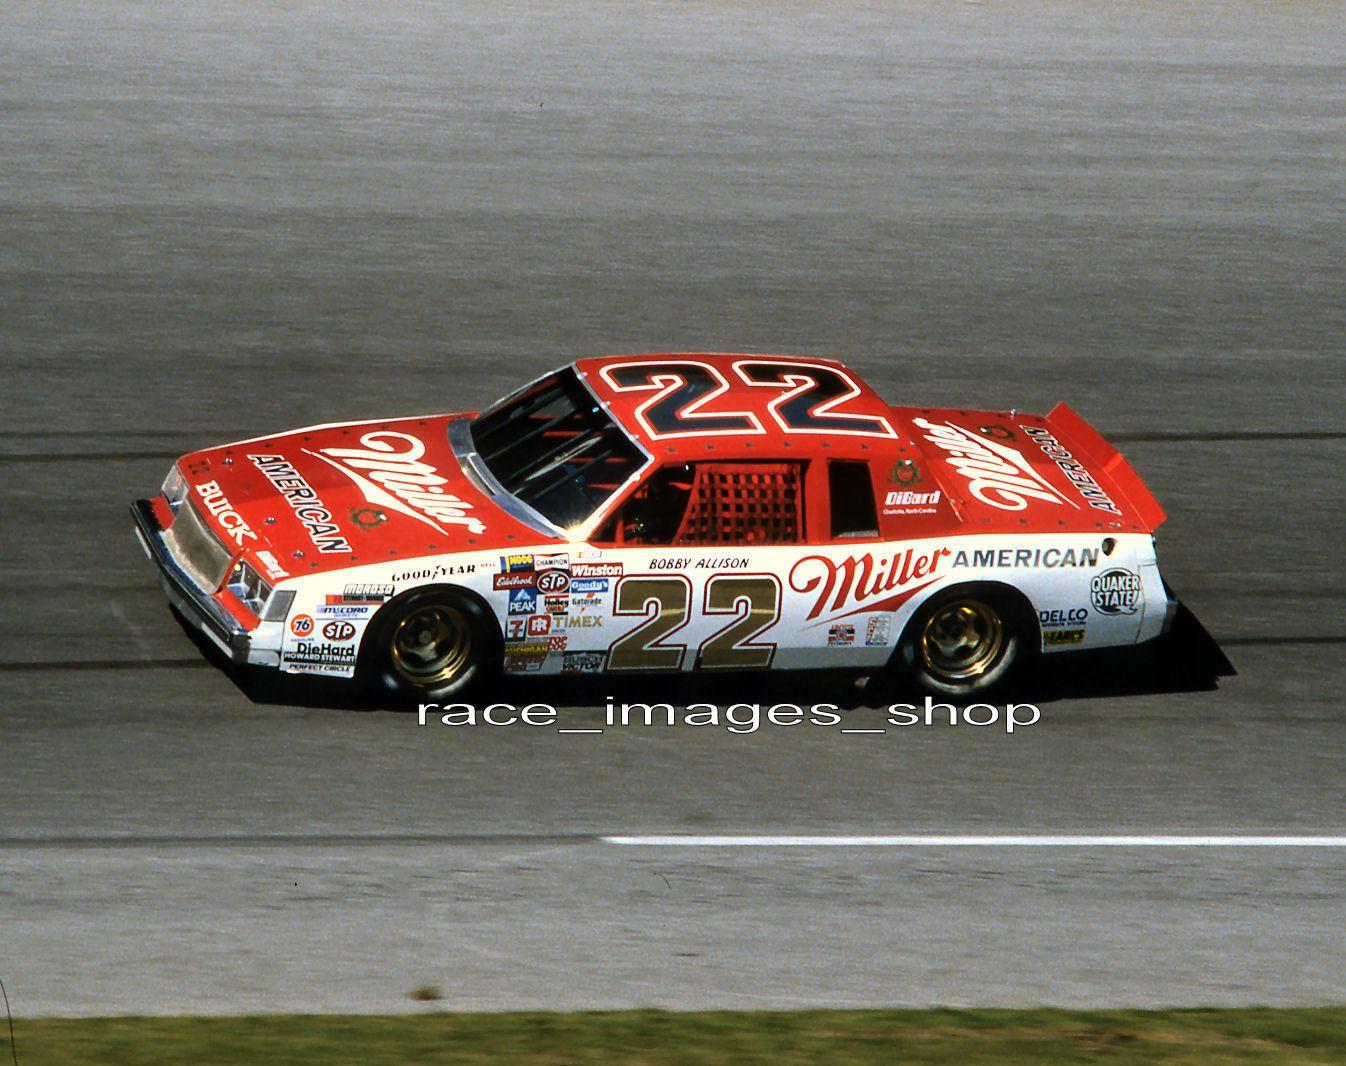 D Fc A Ede A Cef on 1987 Buick Lesabre Motor